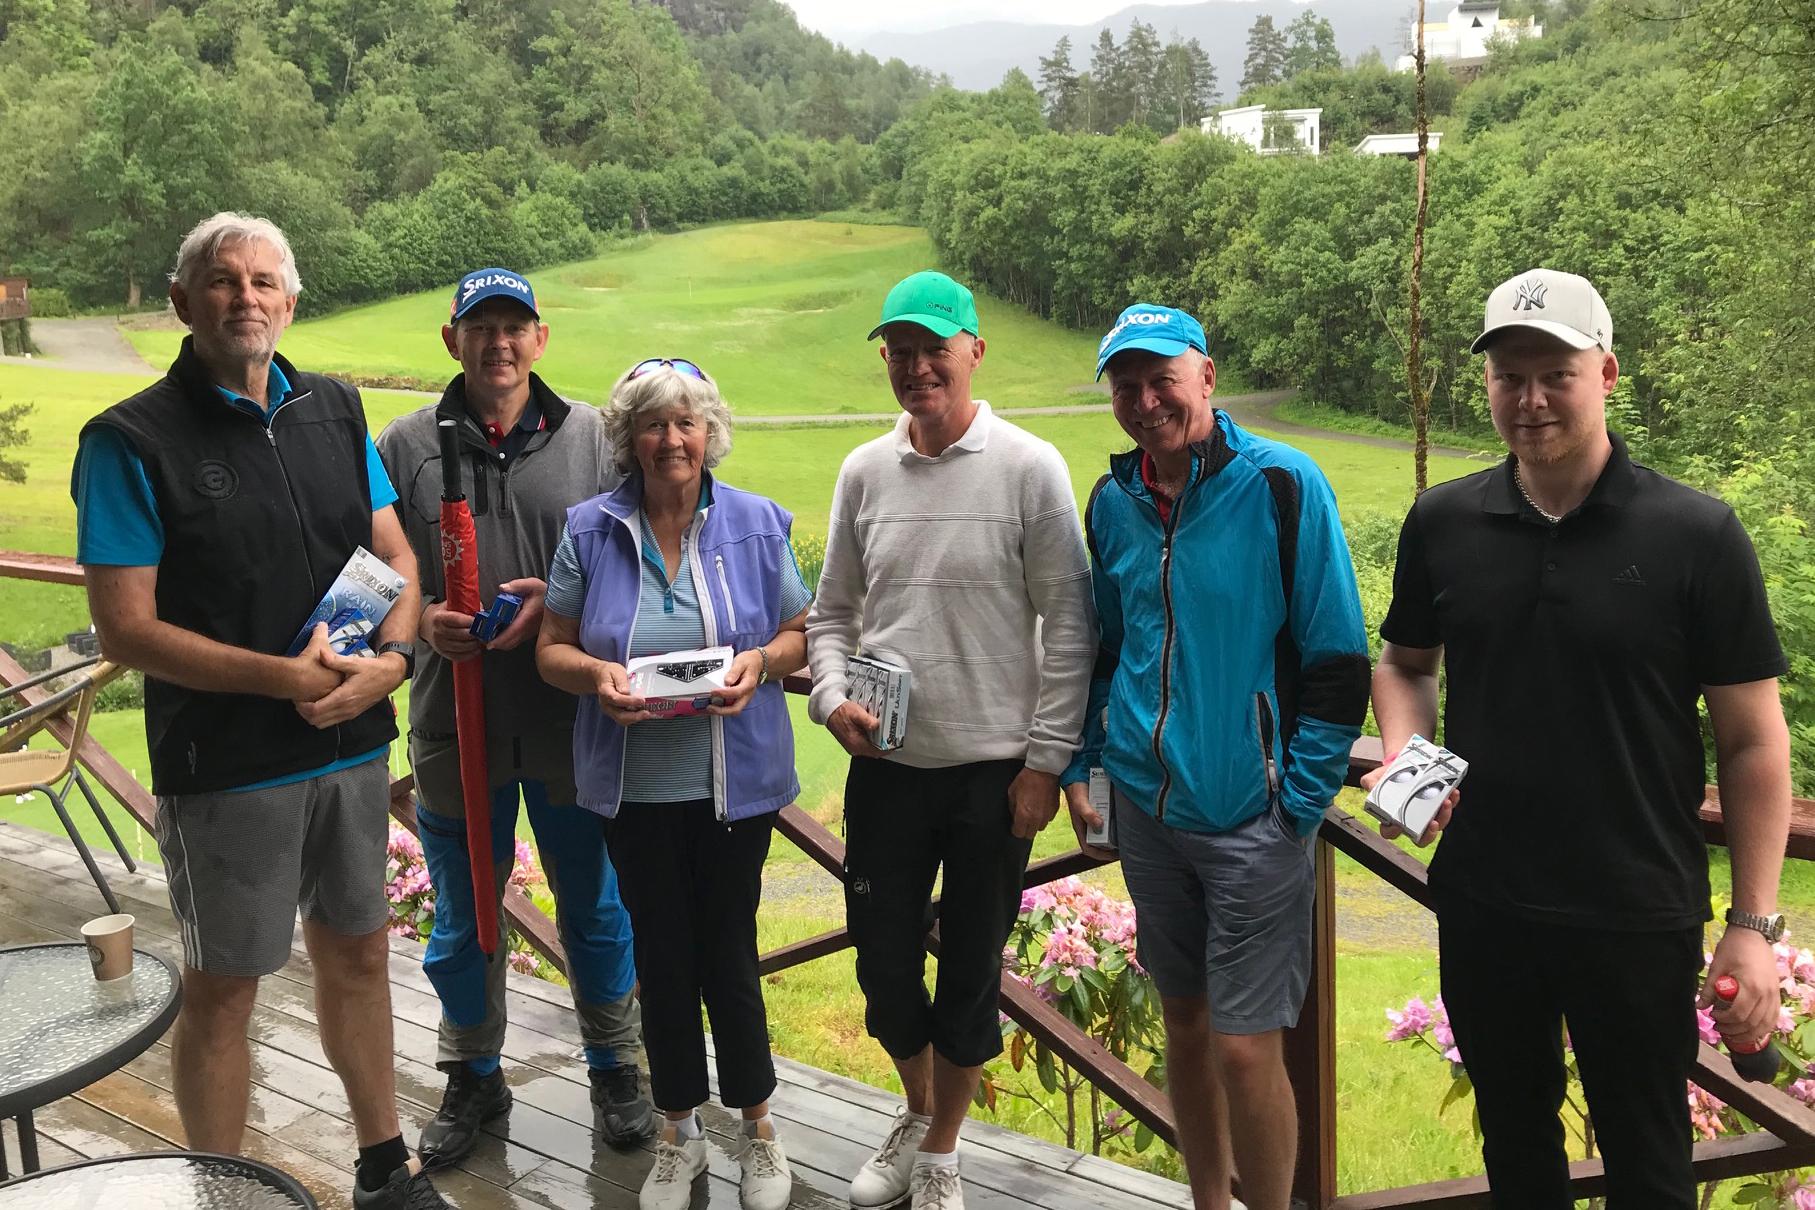 Bilde med Ton Zweedijk, Asle Lunde, Hilde Hodne, Waldemar Olsen, Arvid Rune Larsen og Erlend Rød.